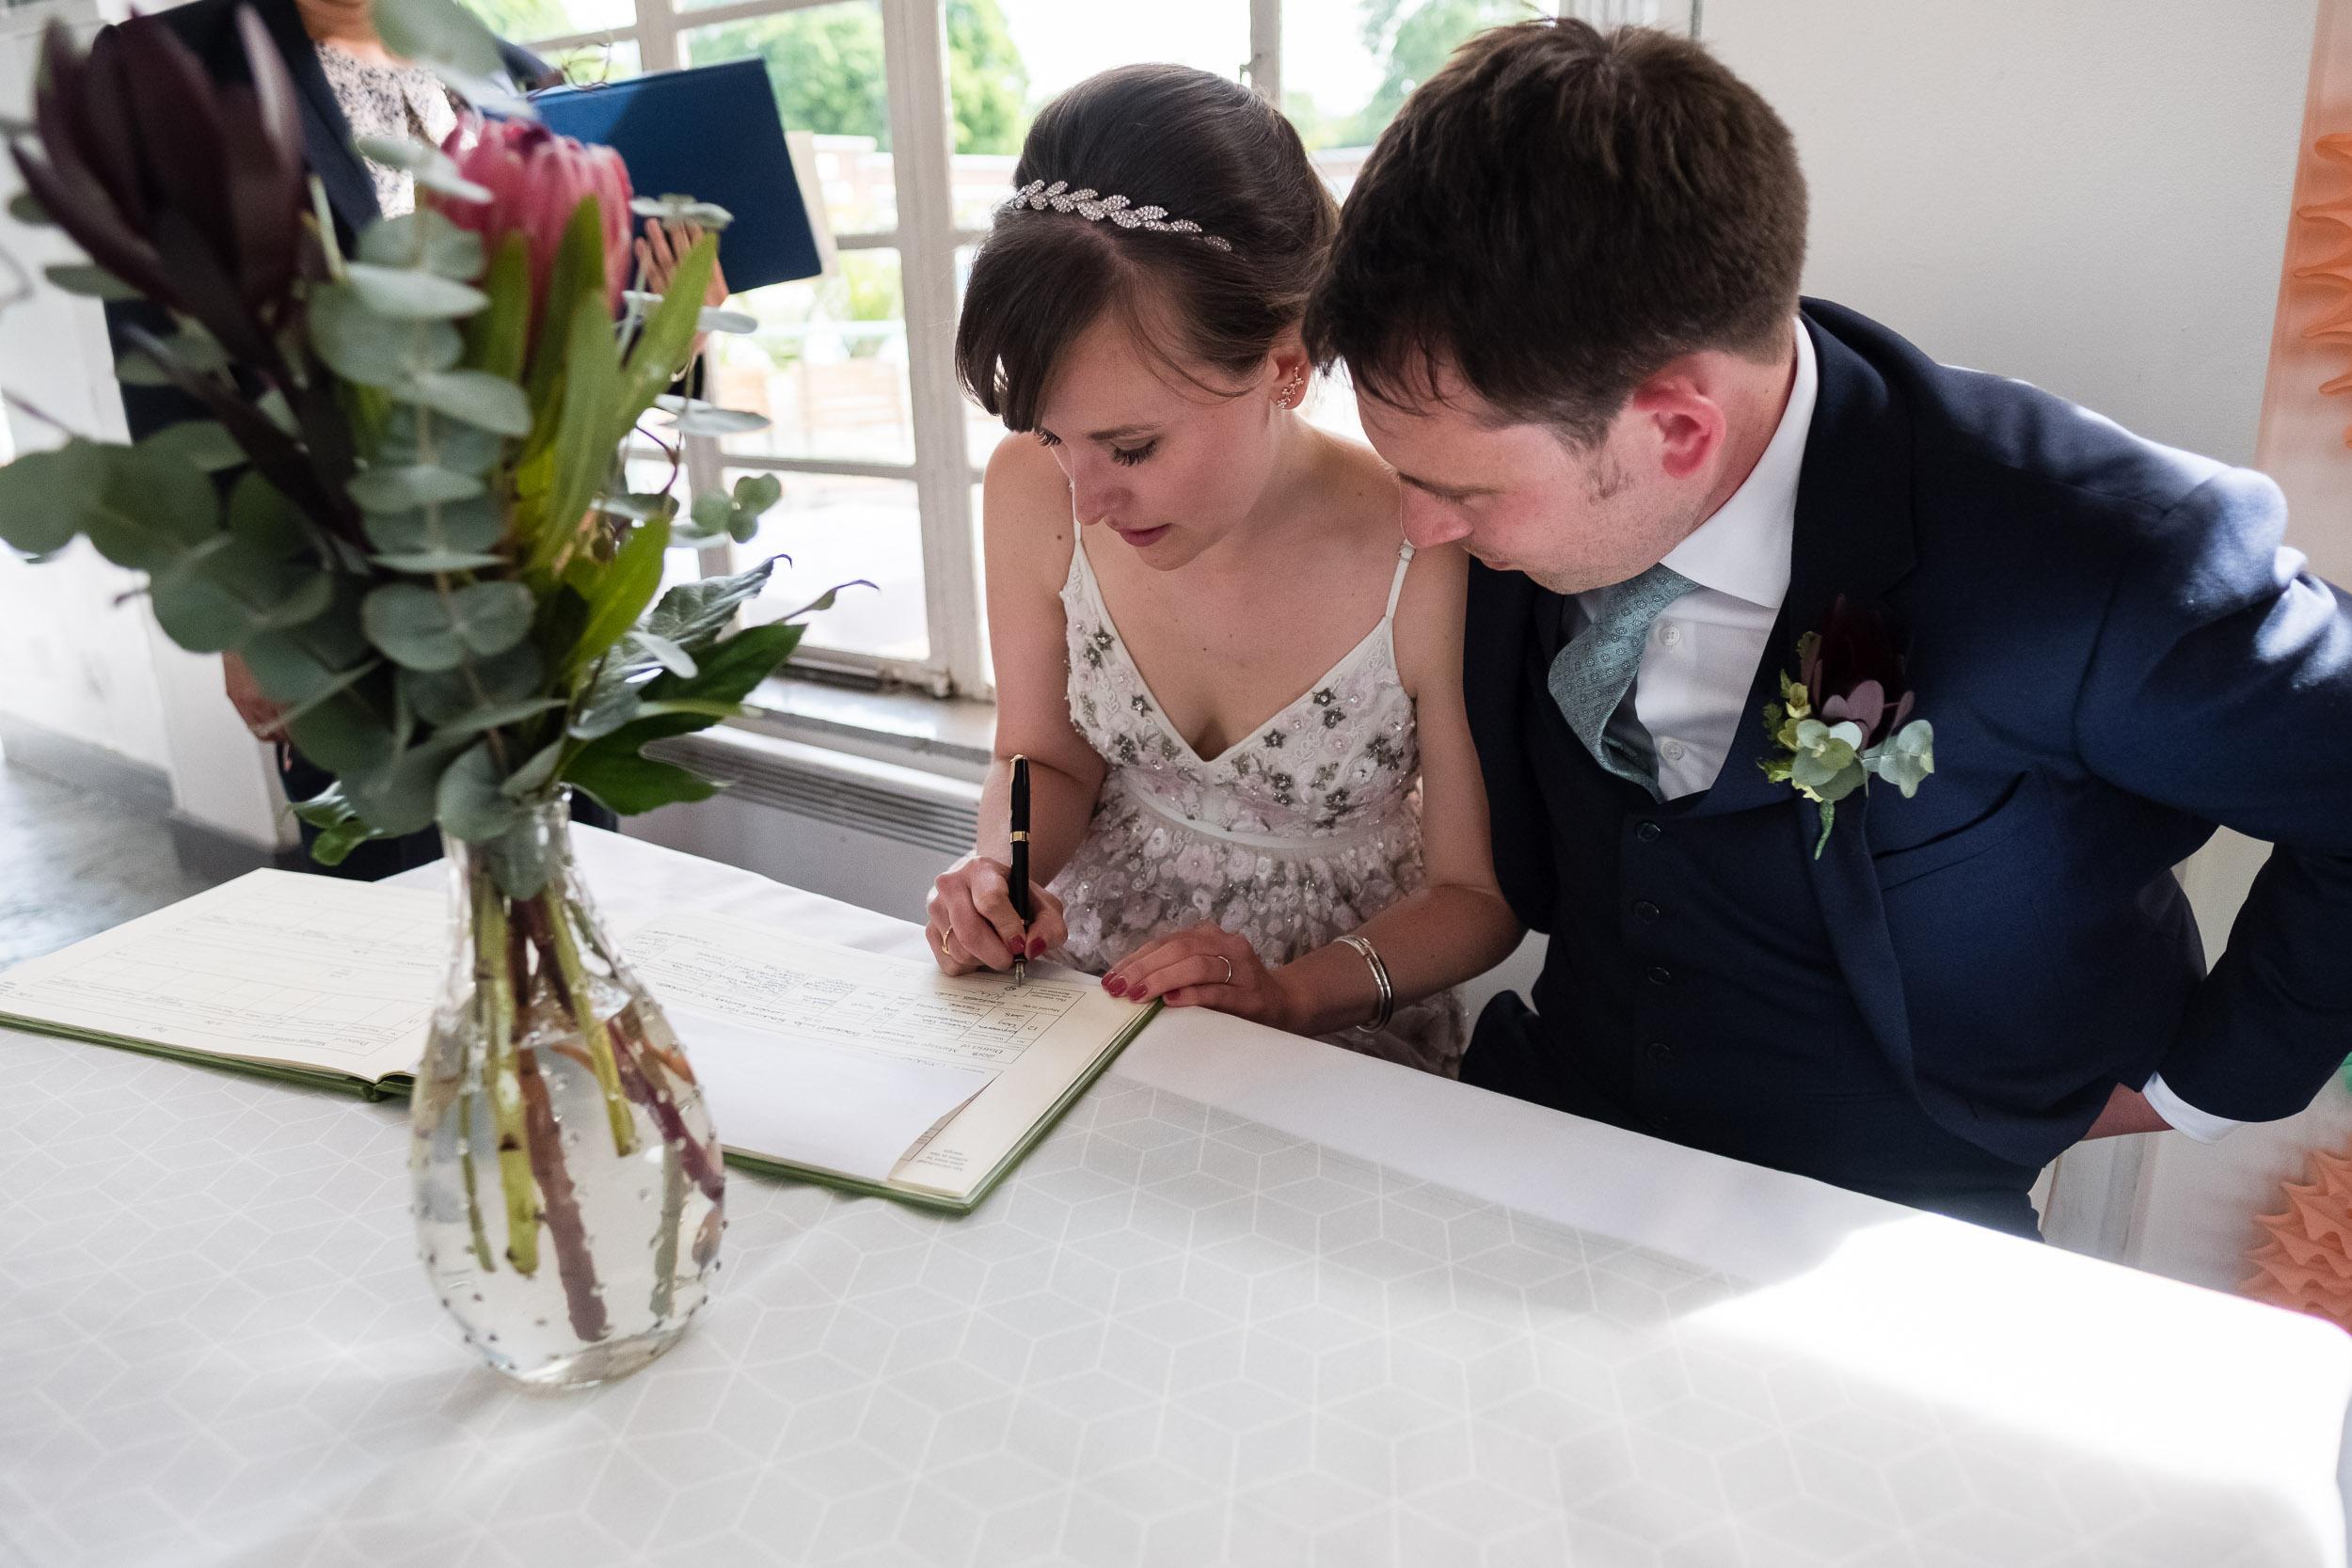 brockwell-lido-brixton-herne-hill-wedding-193.jpg